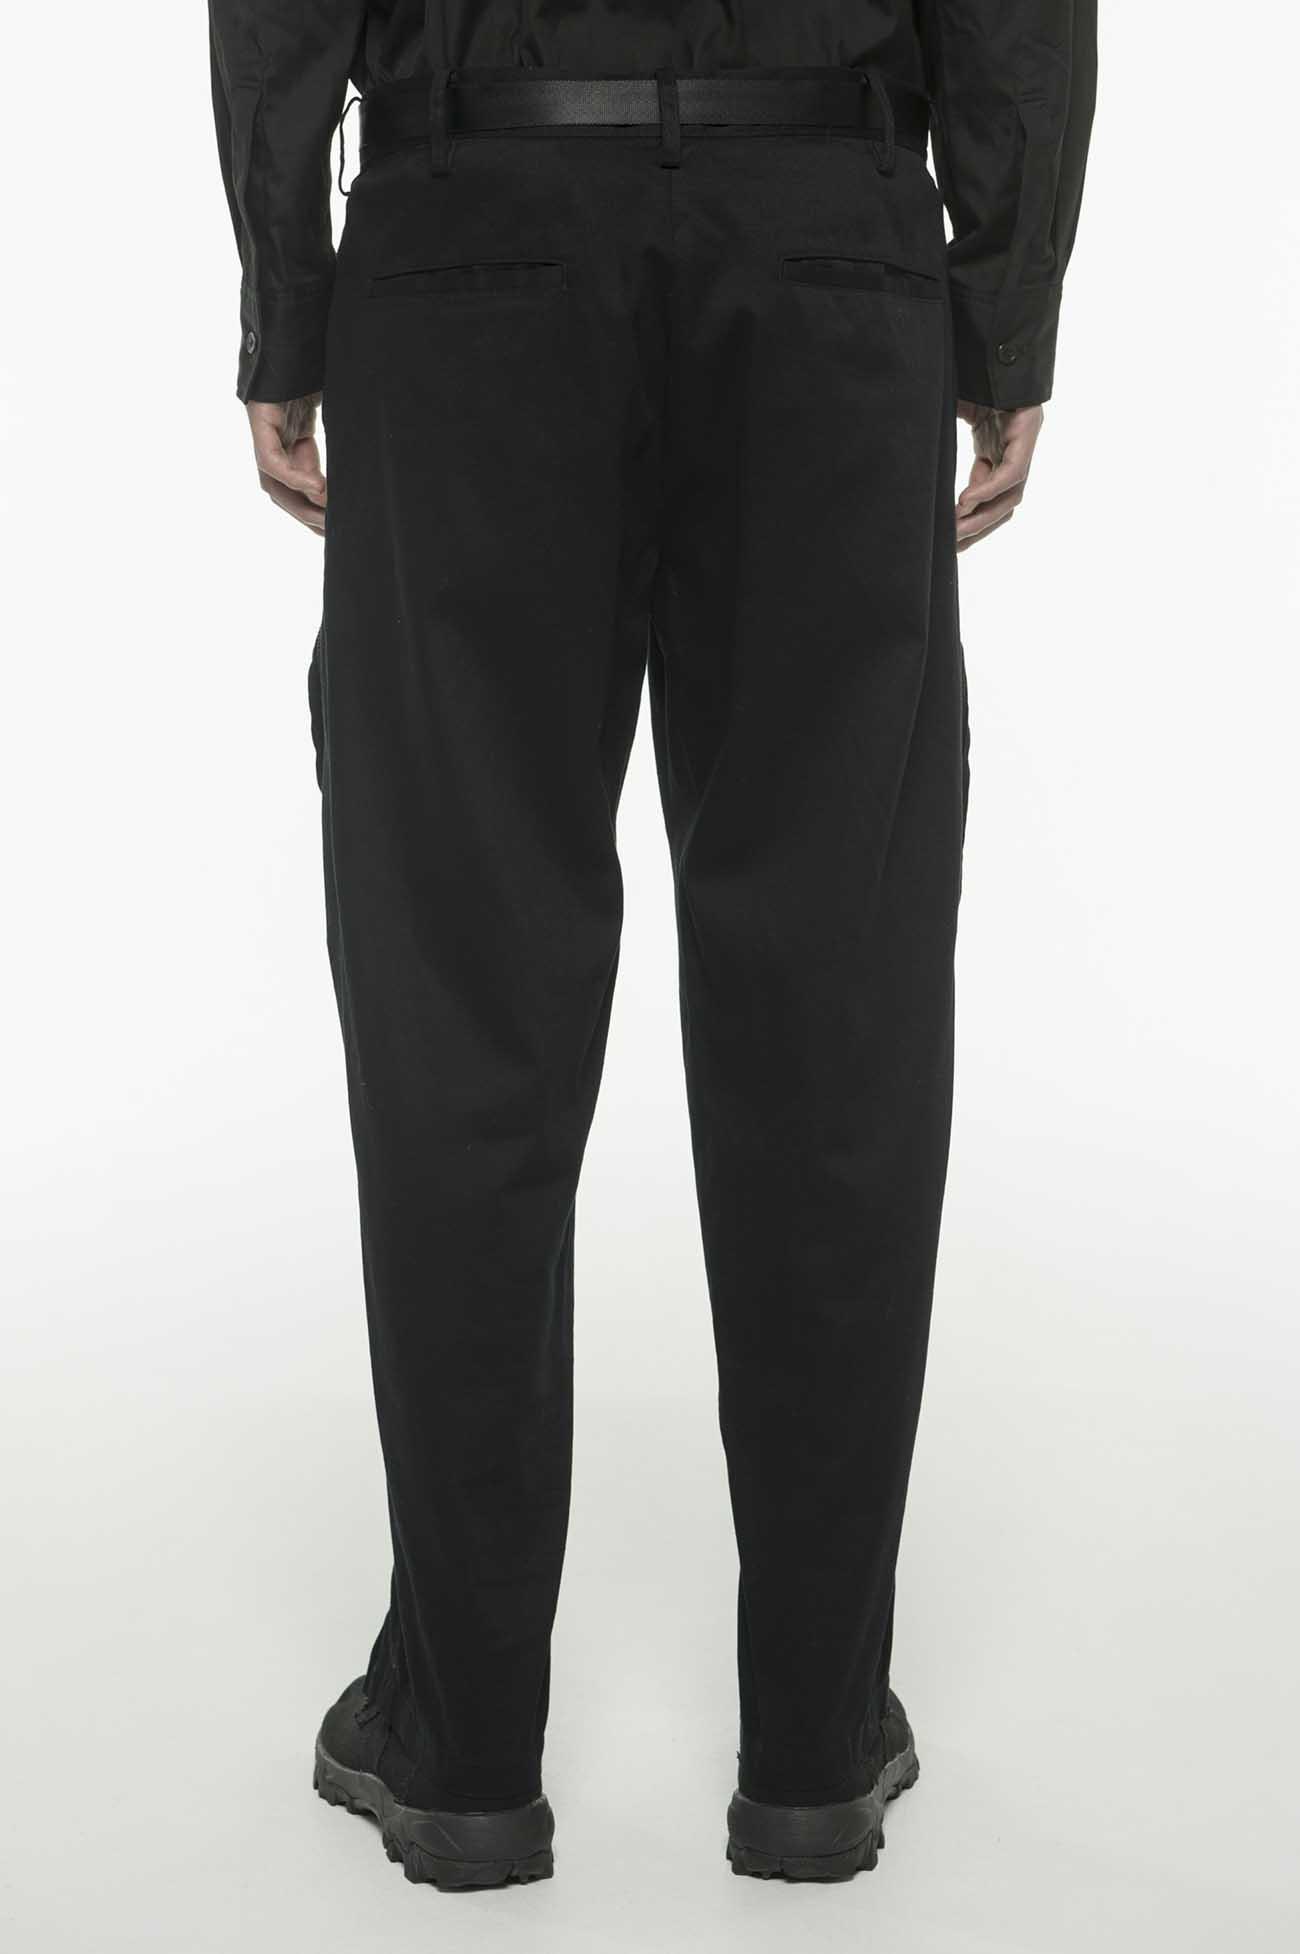 20/Cotton Twill Bondage Zipper Cargo Pants